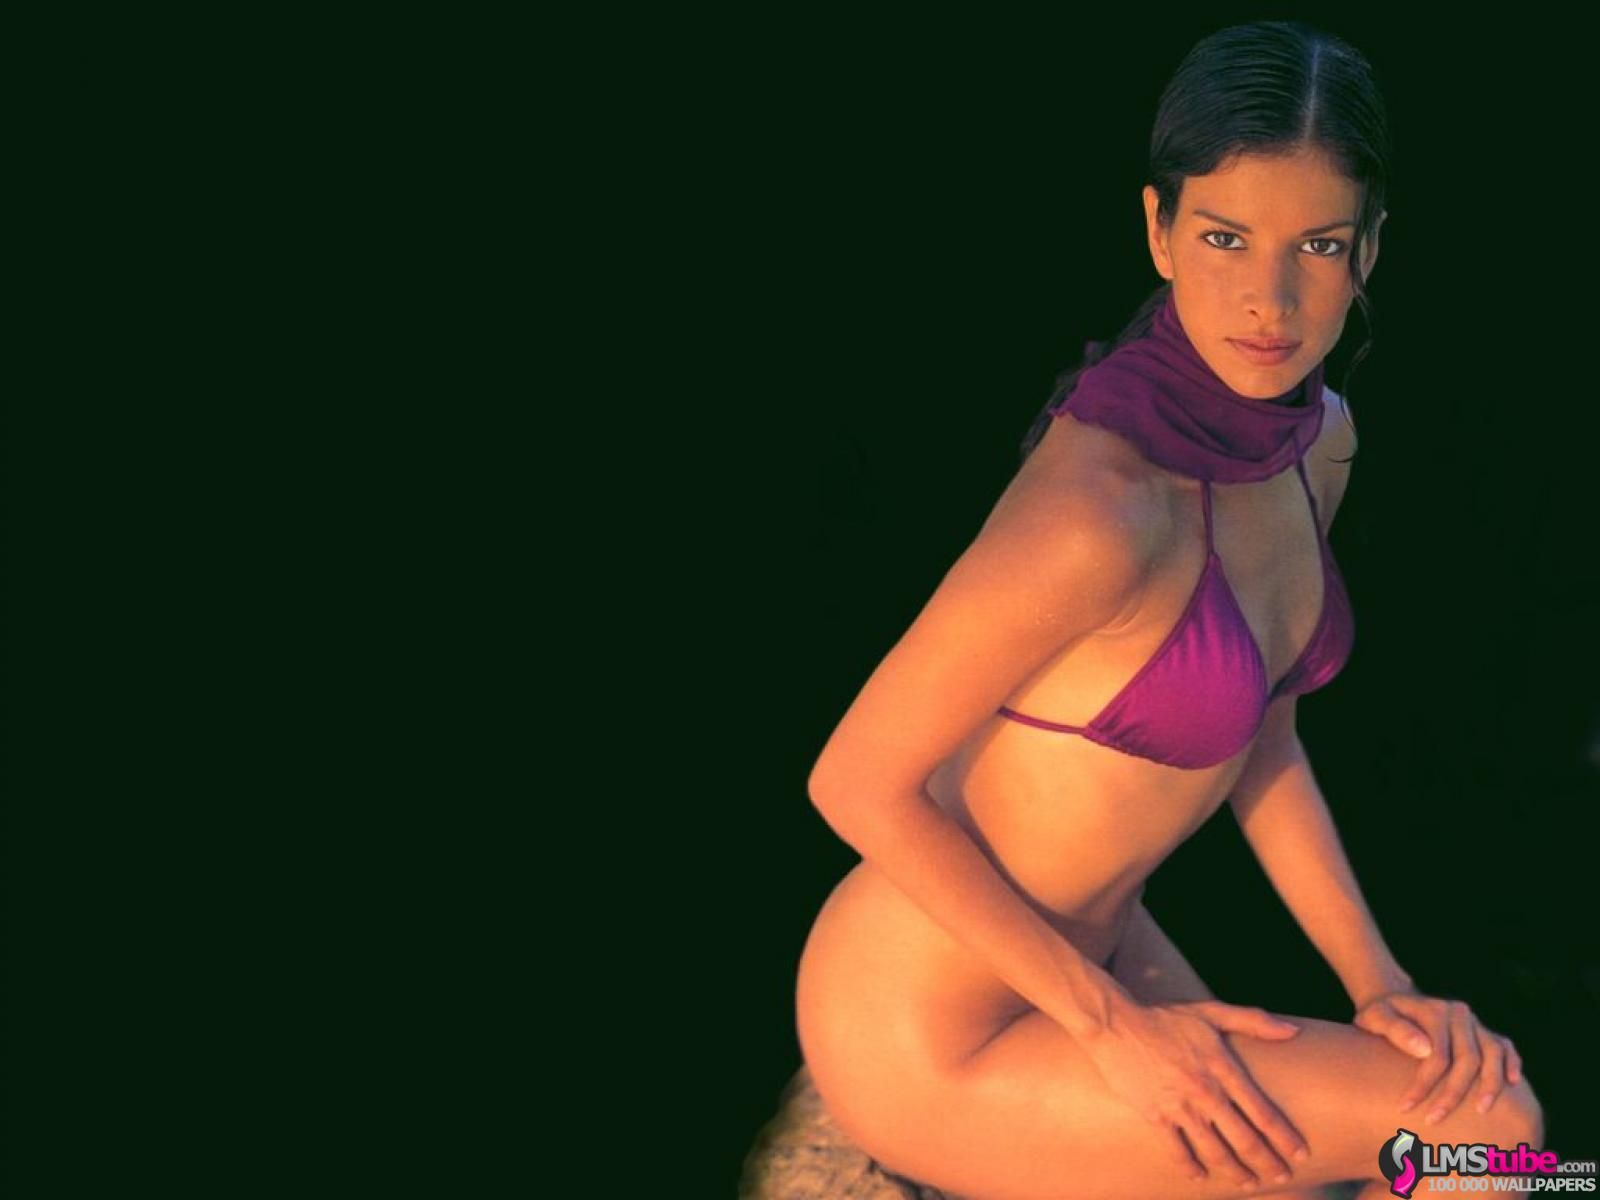 Erotica Patricia Velasquez naked (92 photo), Topless, Fappening, Twitter, cameltoe 2006